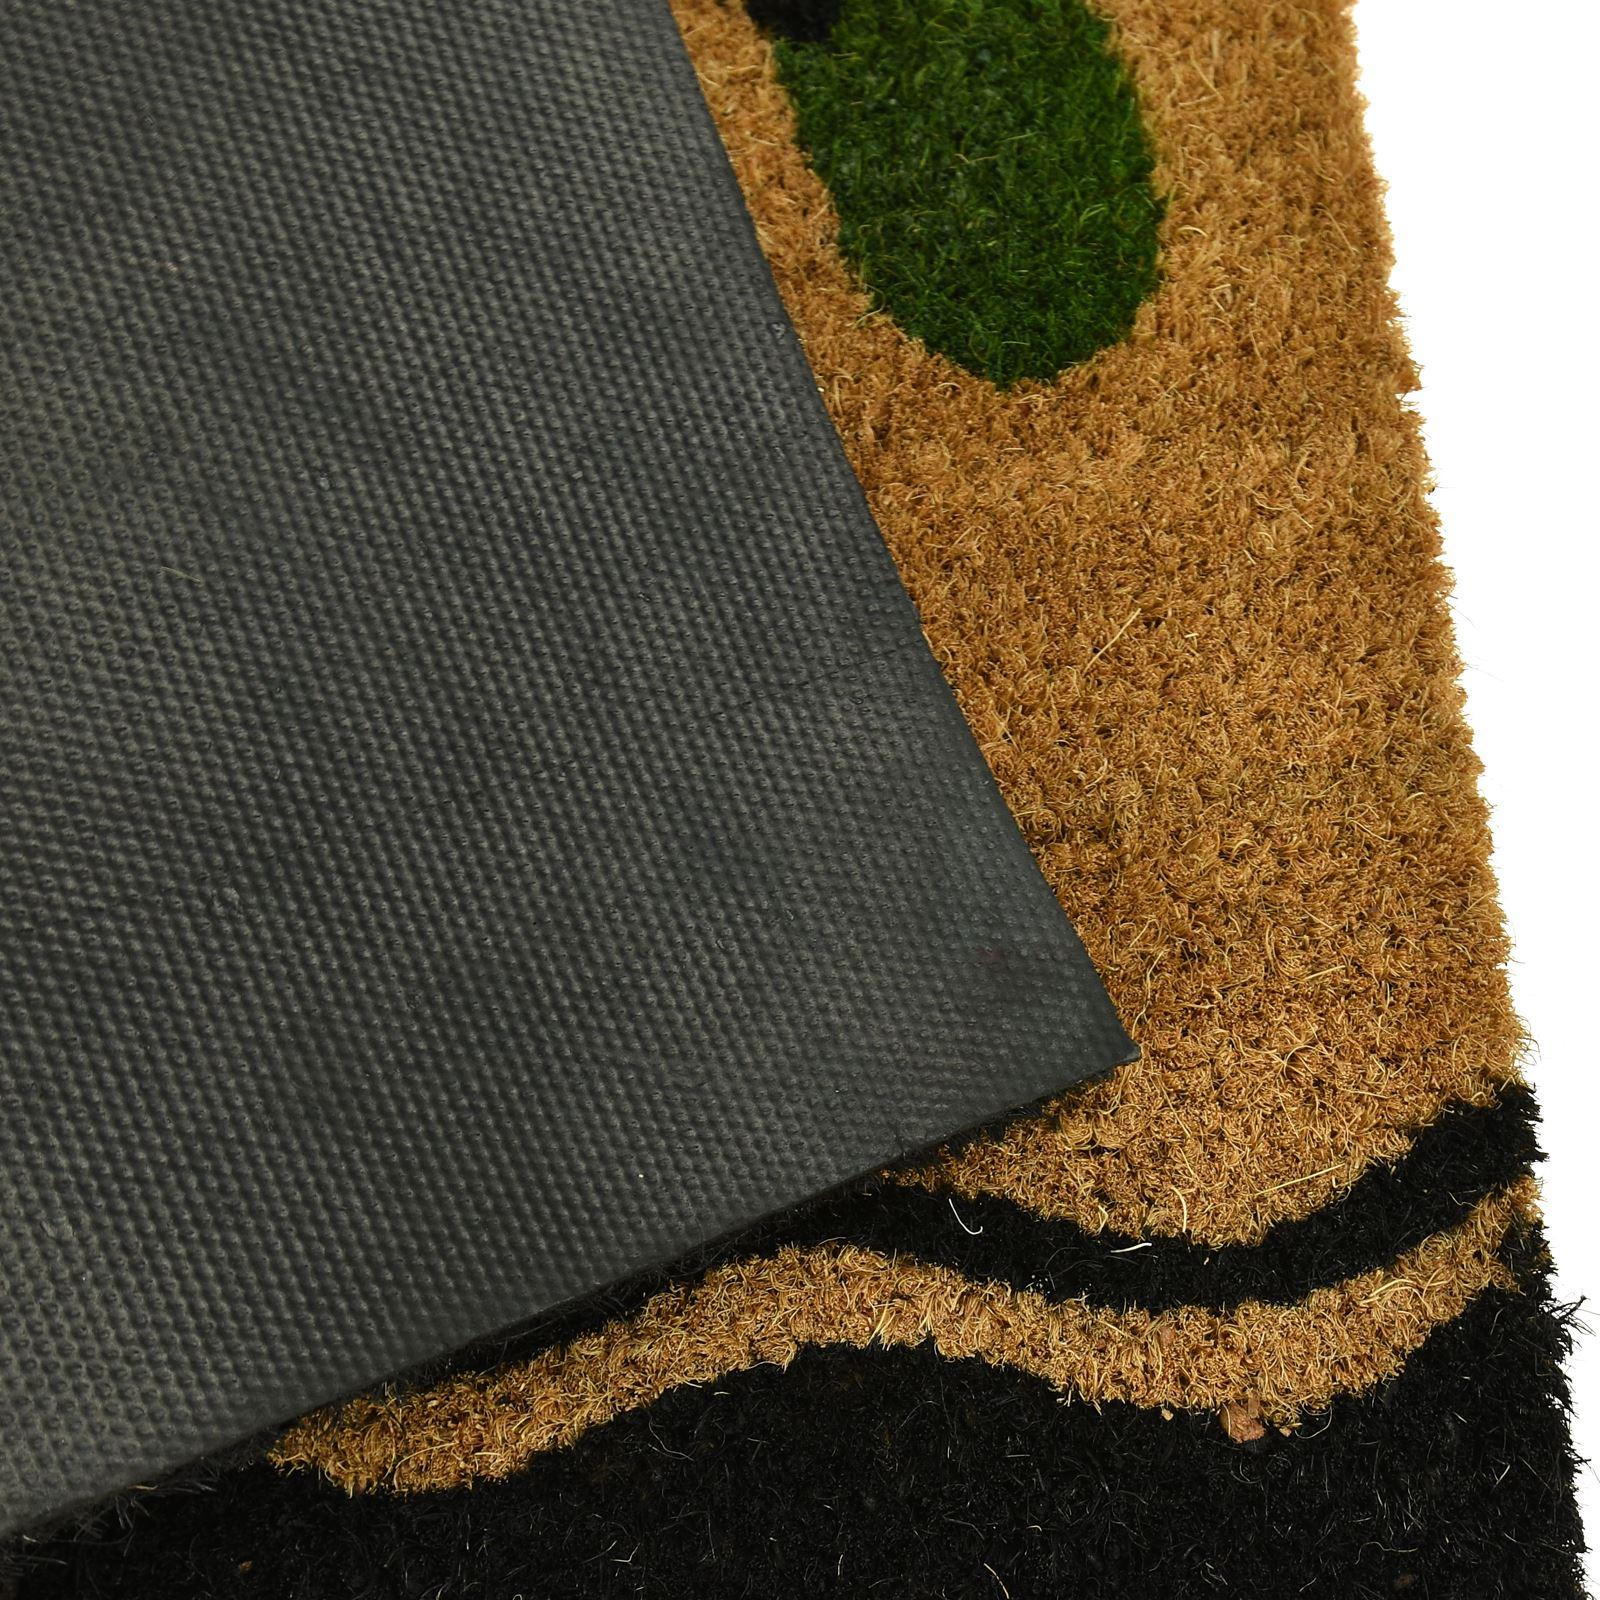 Plain-Non-Slip-Door-Mat-Tough-Natural-Coir-PVC-Back-Welcome-Doormat-40-x-60cm miniatura 46